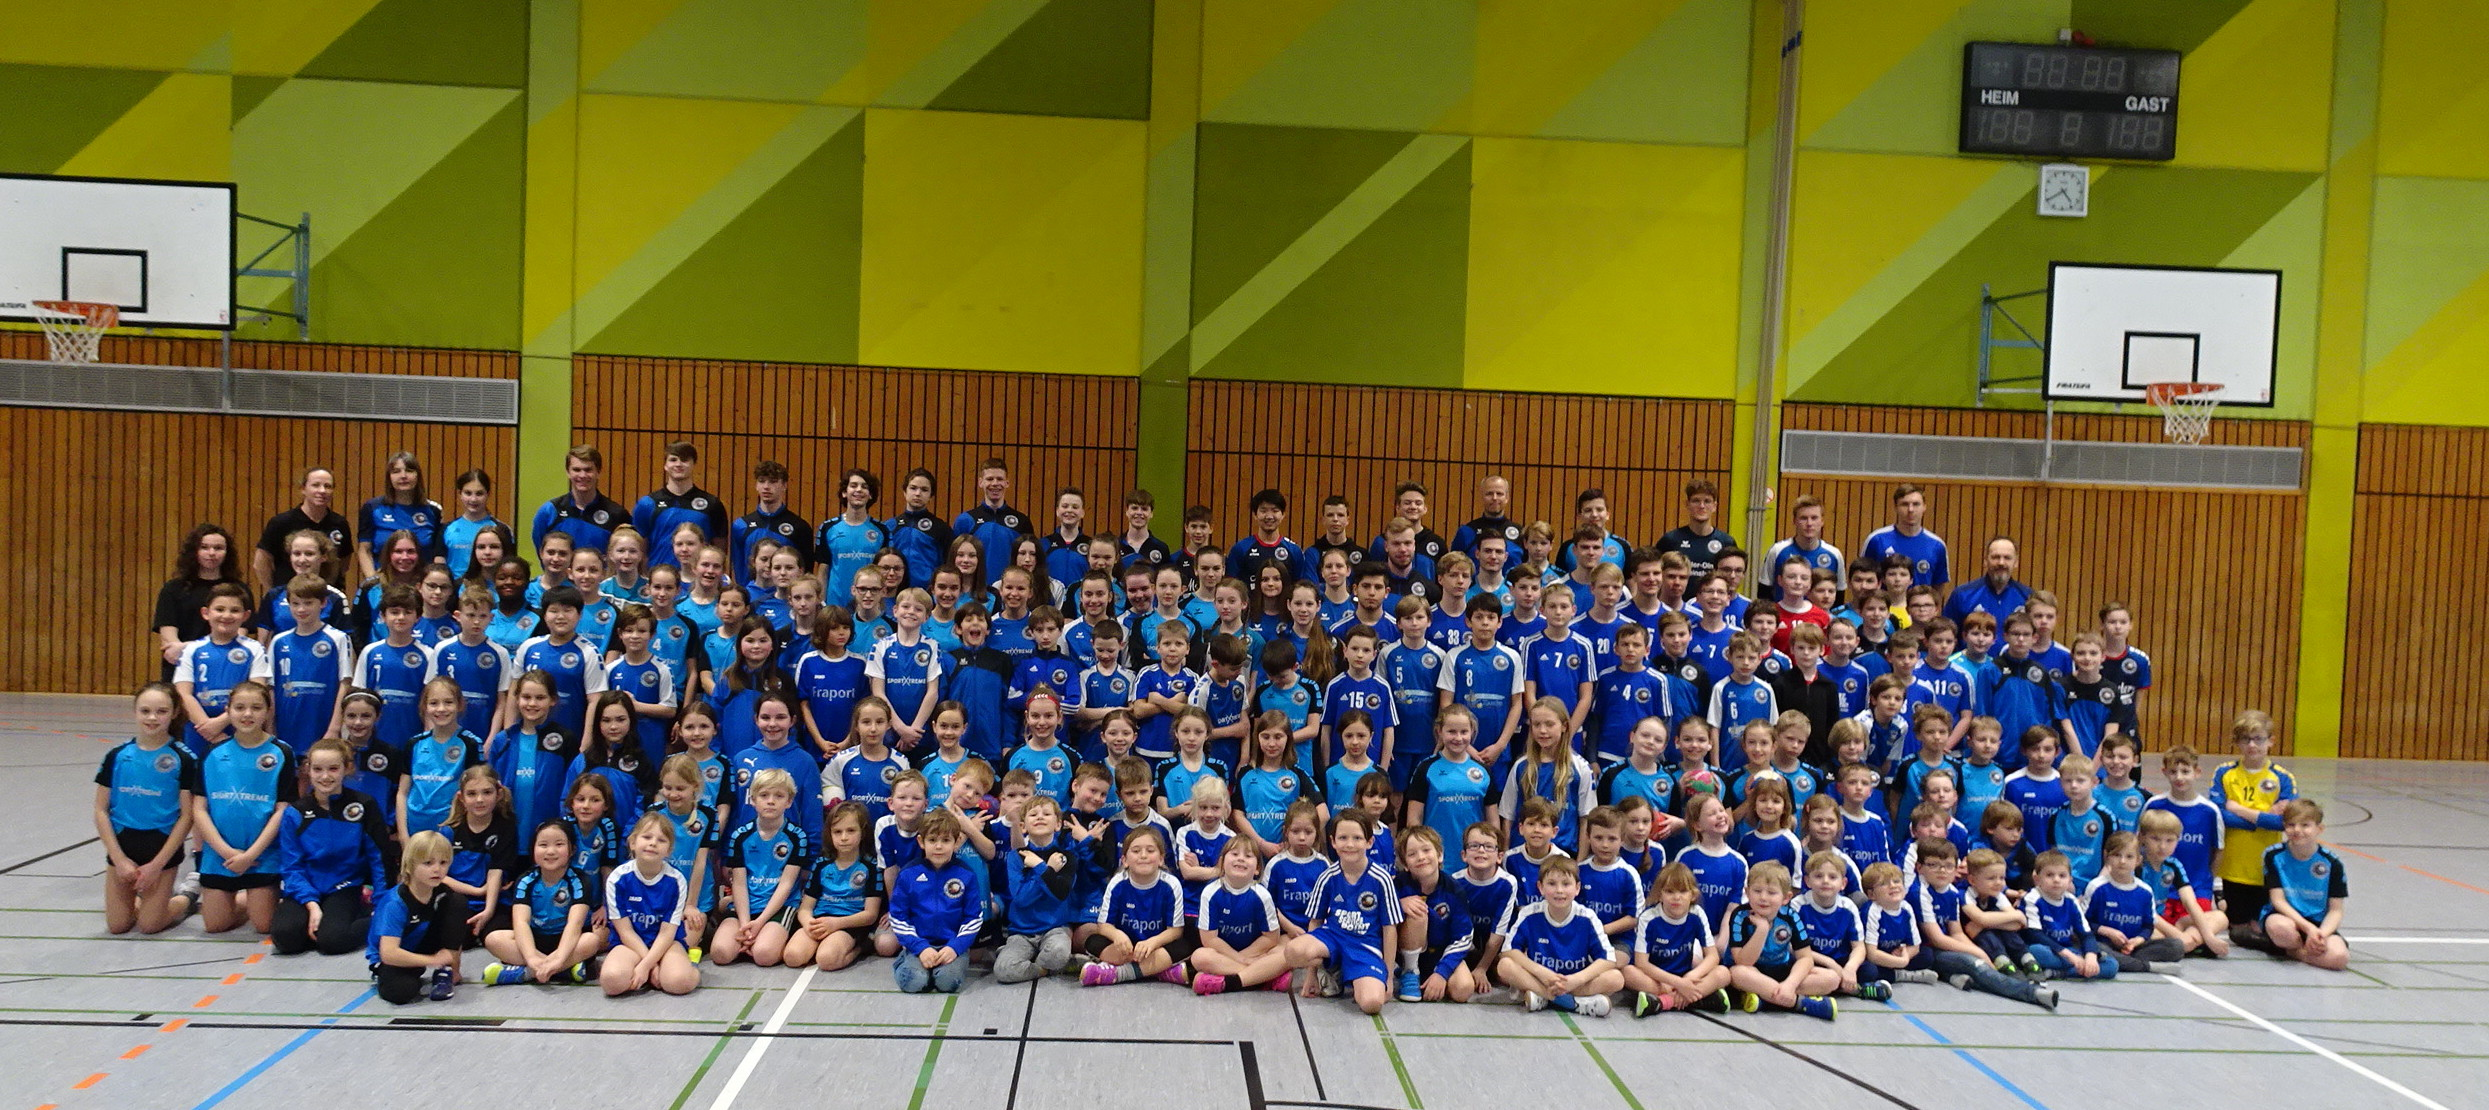 Handball-Grundschulprojekt beim TV Nieder-Olm